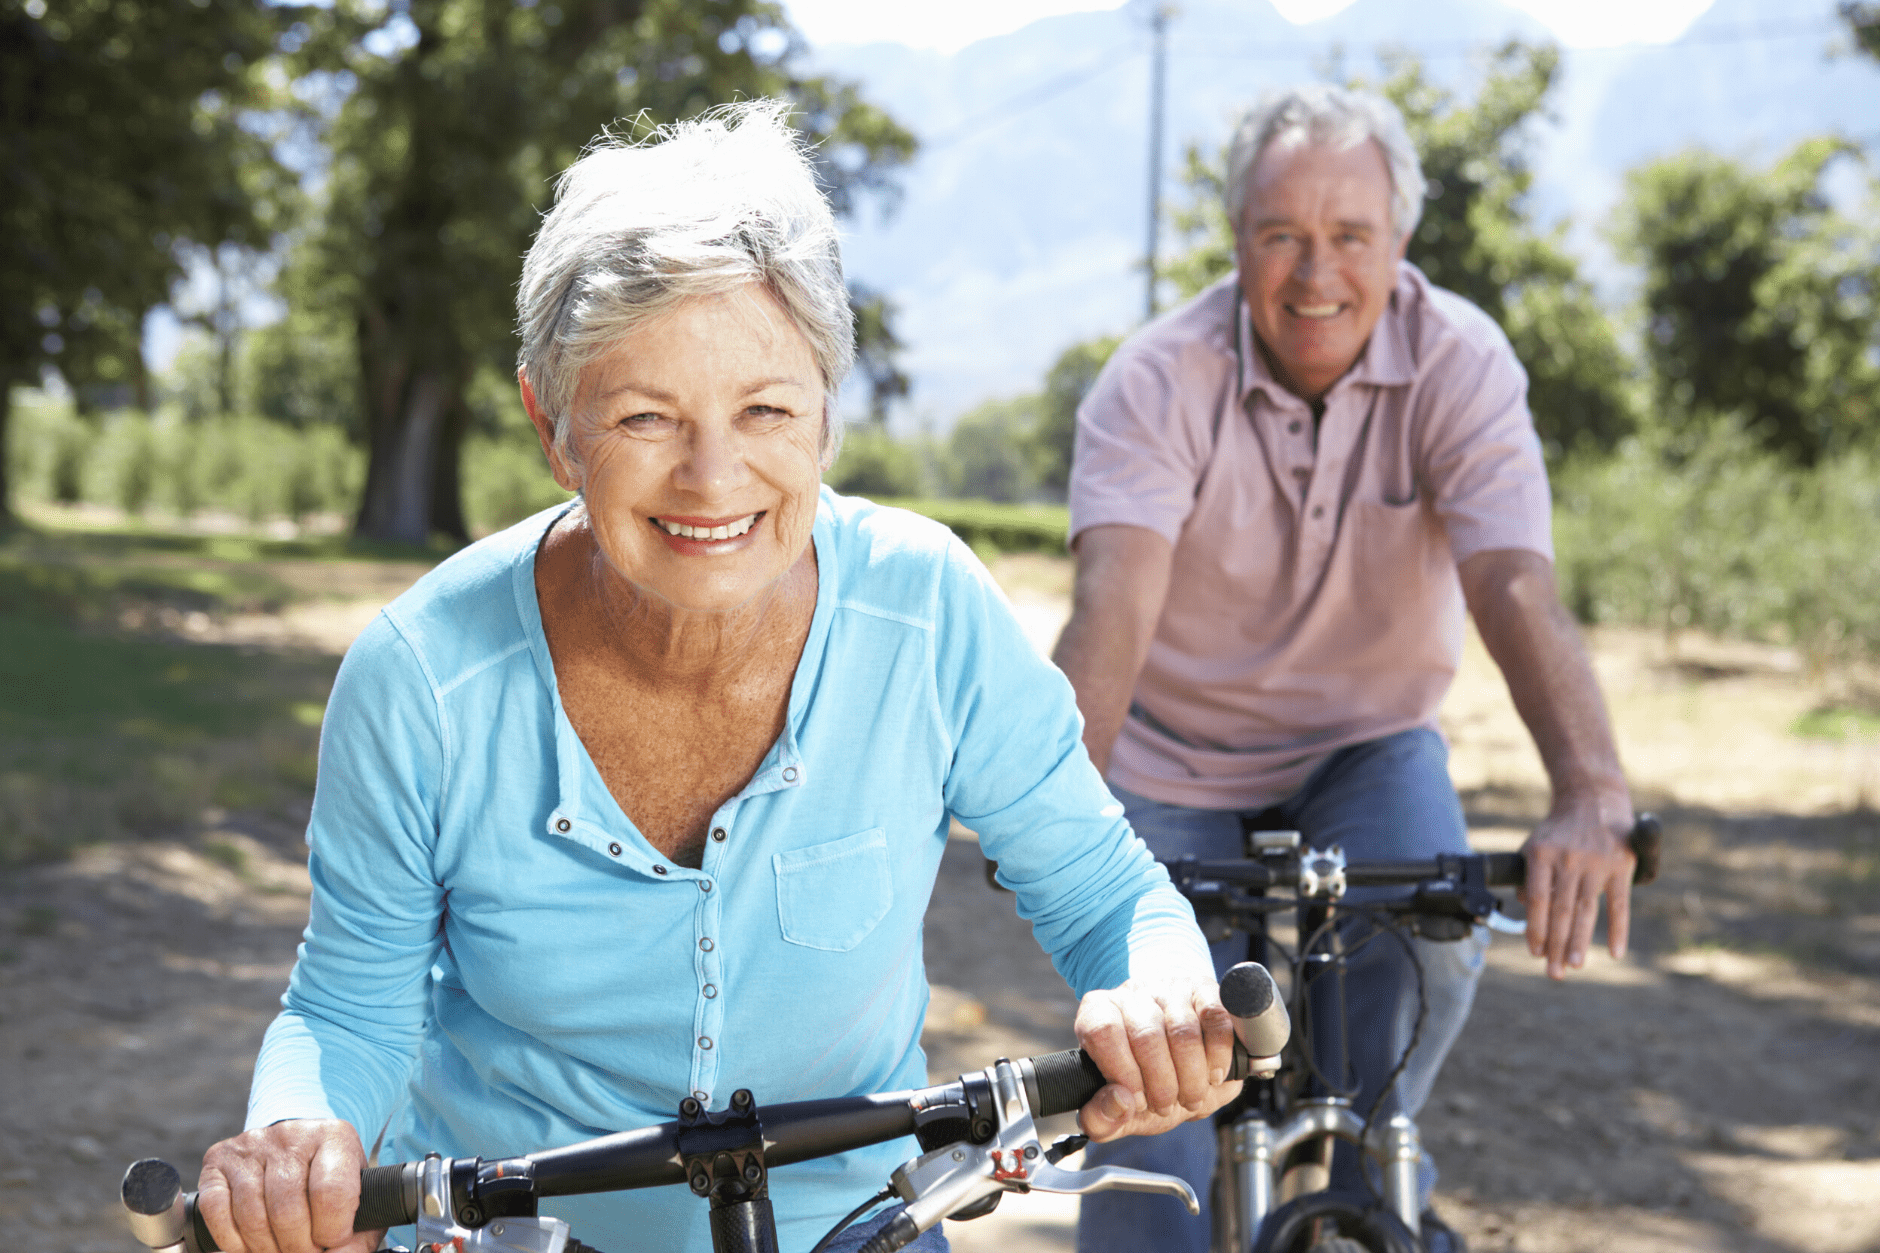 Olders biking